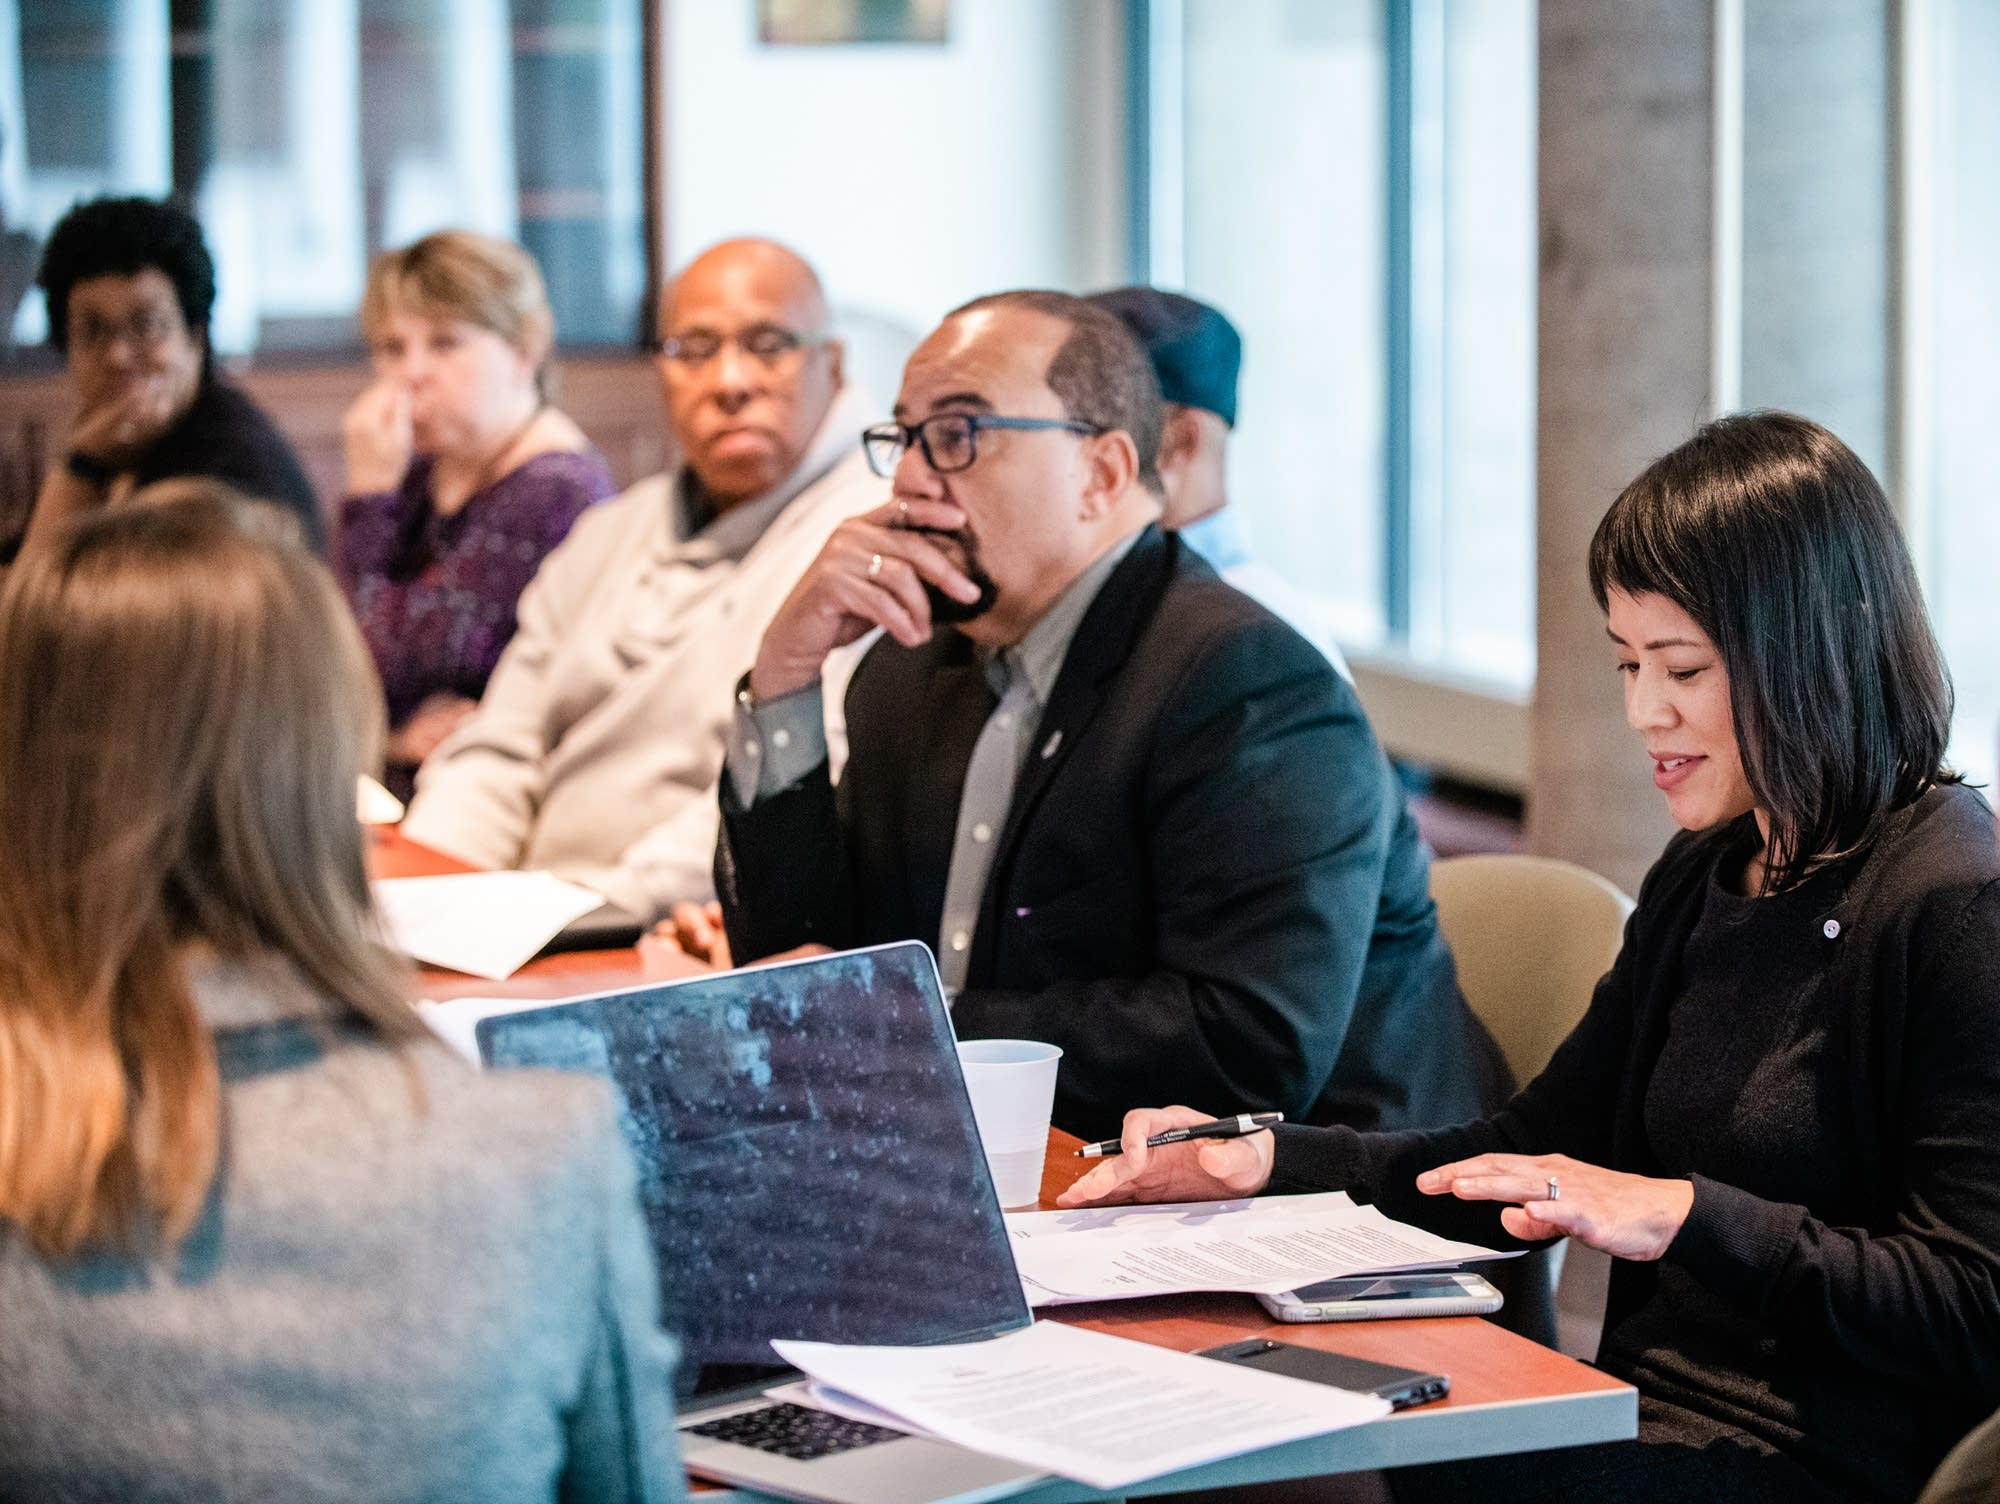 A coalition of media members discuss how to transform racial narratives.